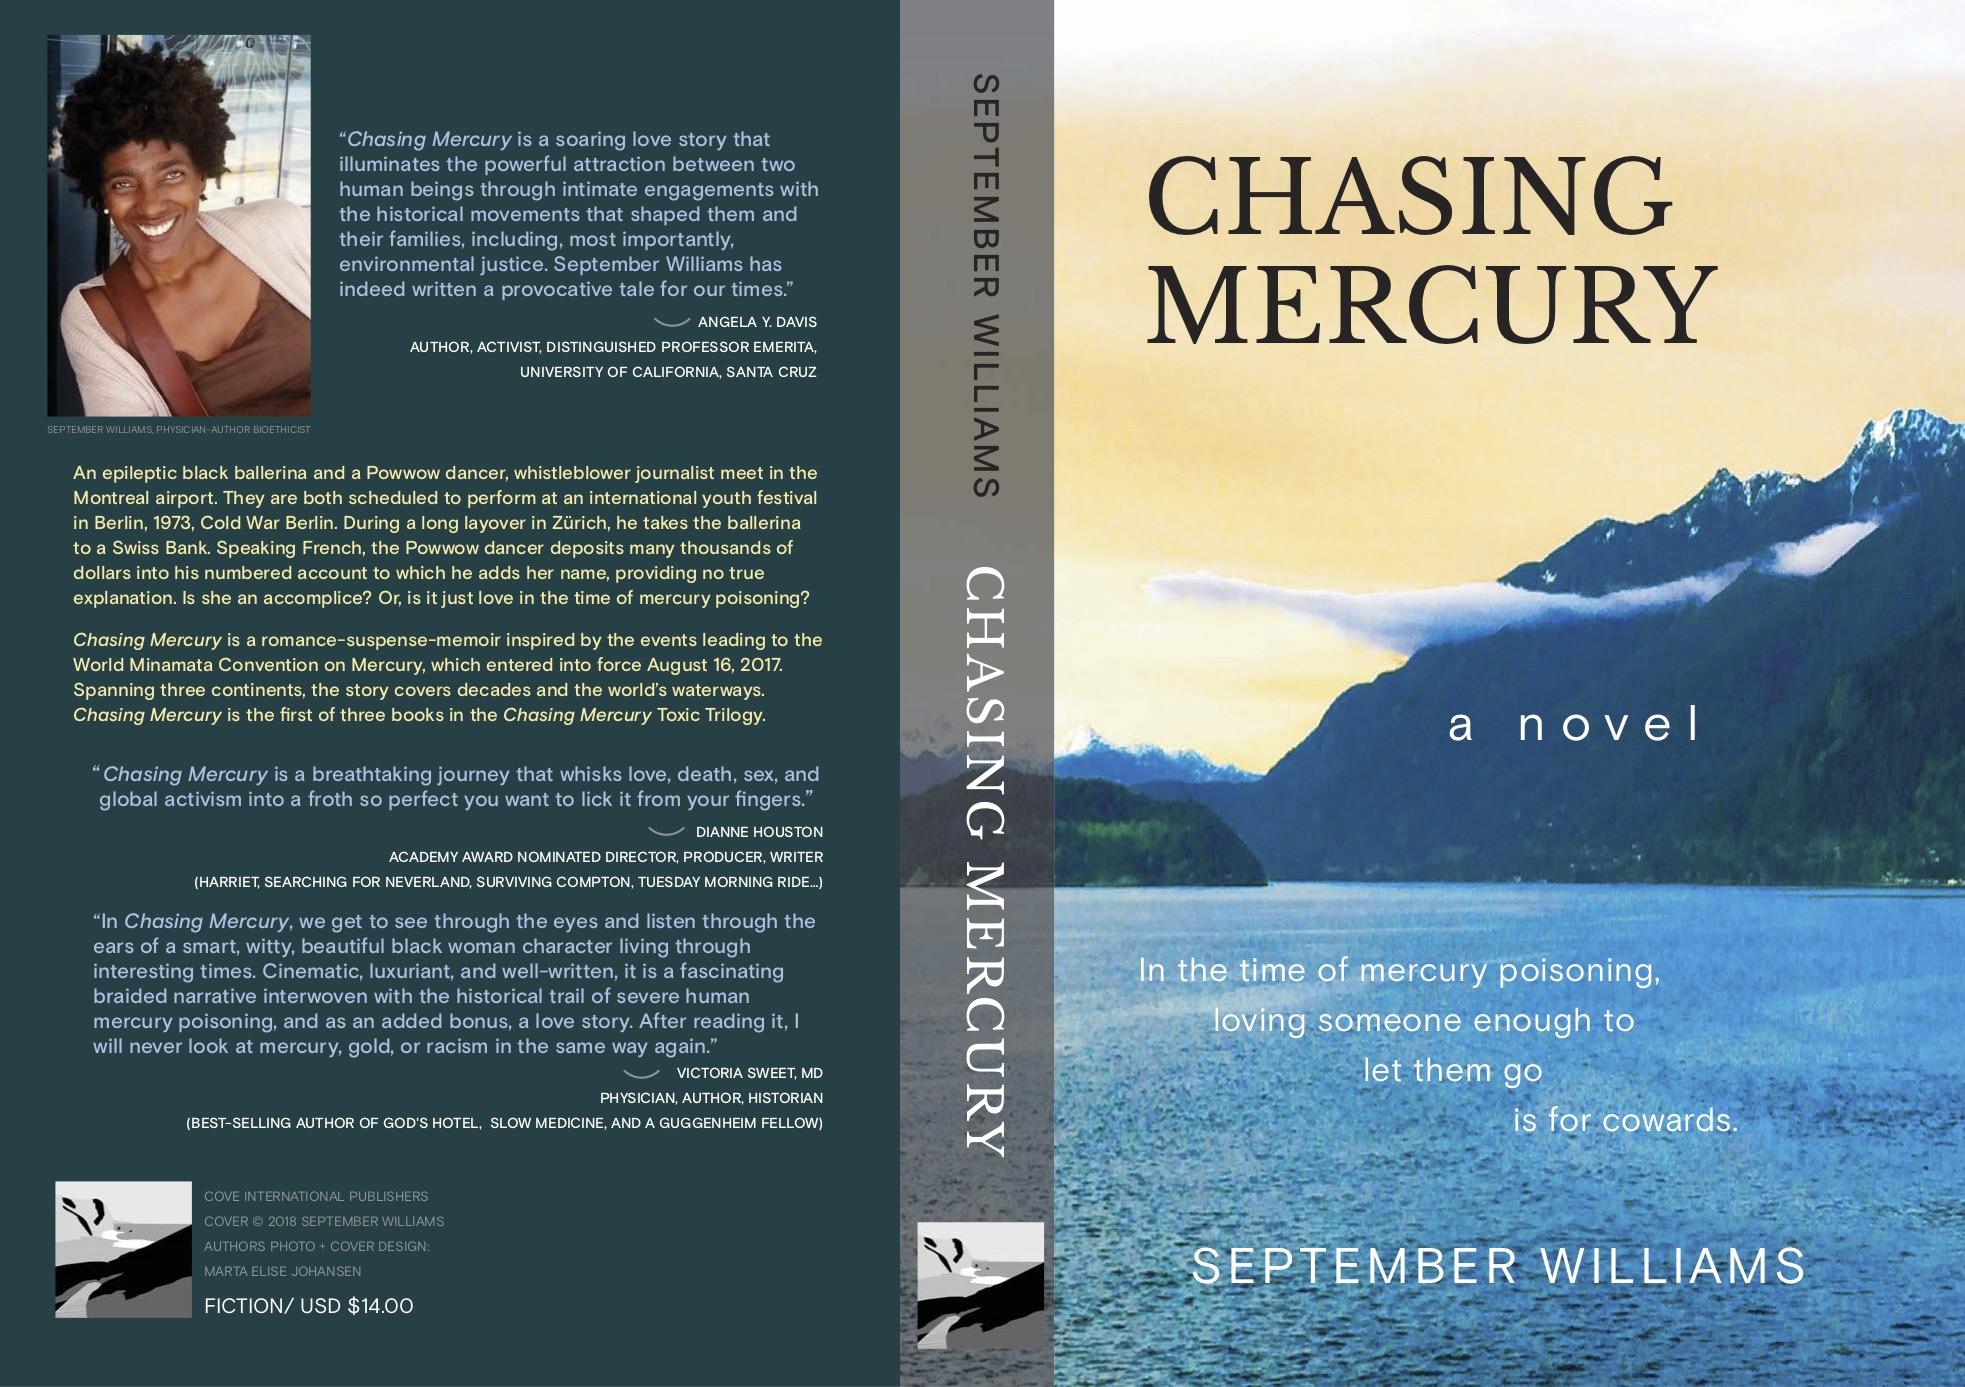 CHASING MERCURY BOOKCOVER AMAZON ps 2.jpg